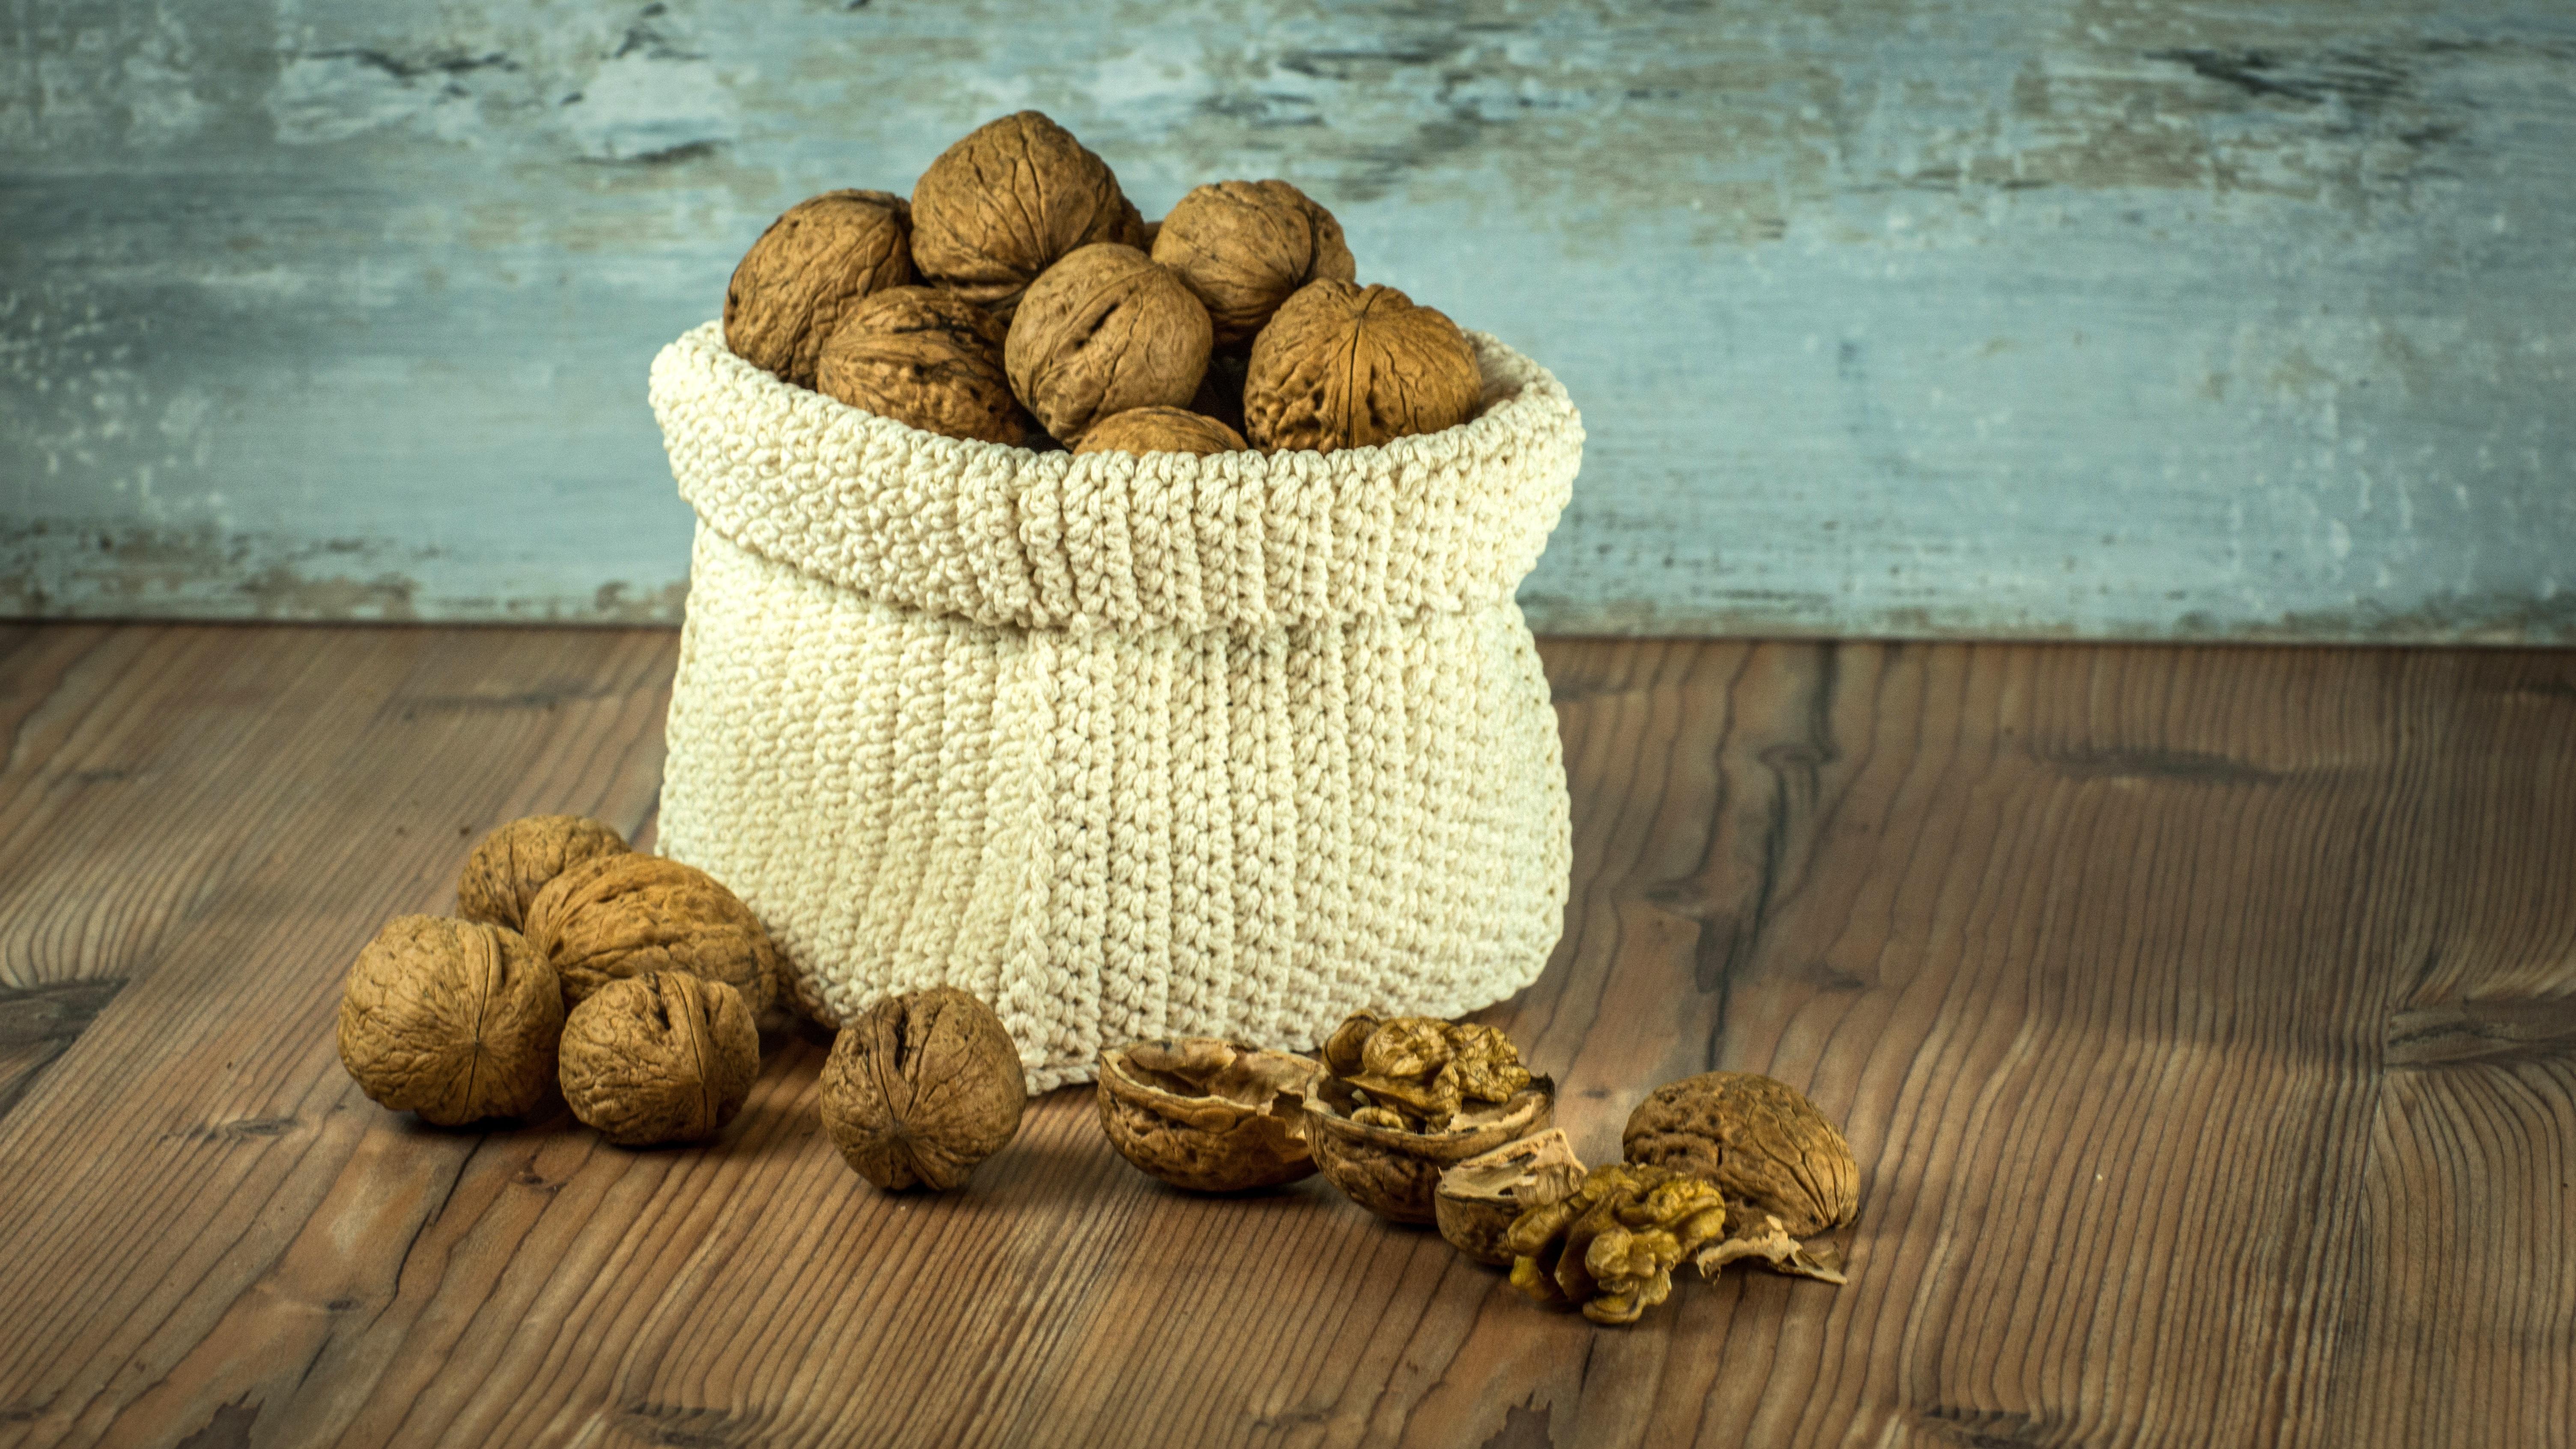 Free Images : table, wood, food, produce, crop, brown, bag